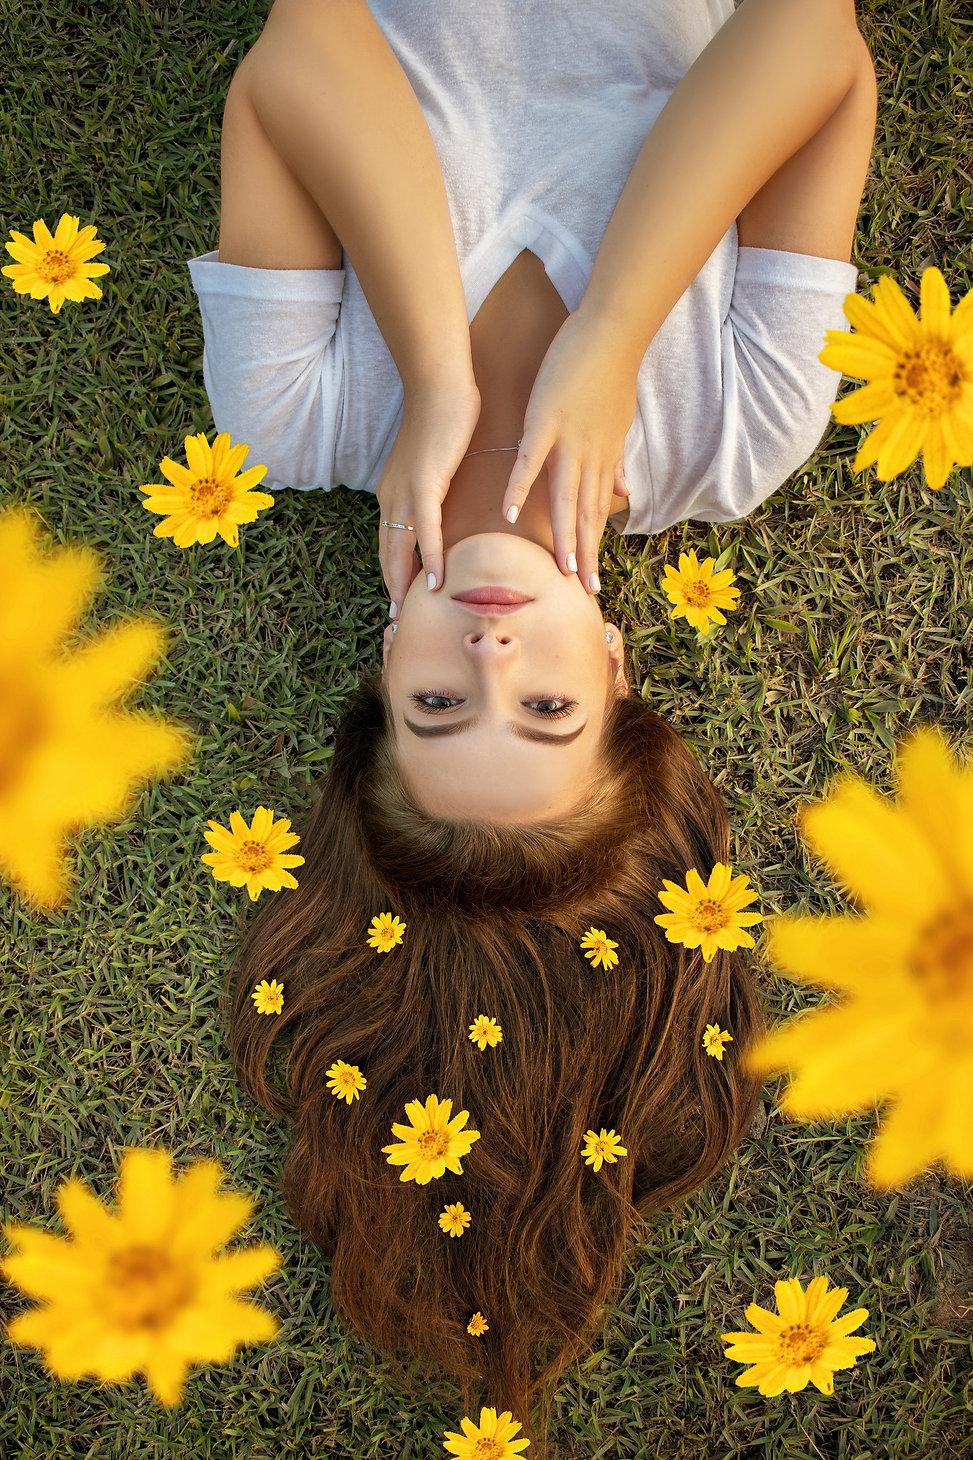 upside-down-photo-of-a-woman-1821095.jpg